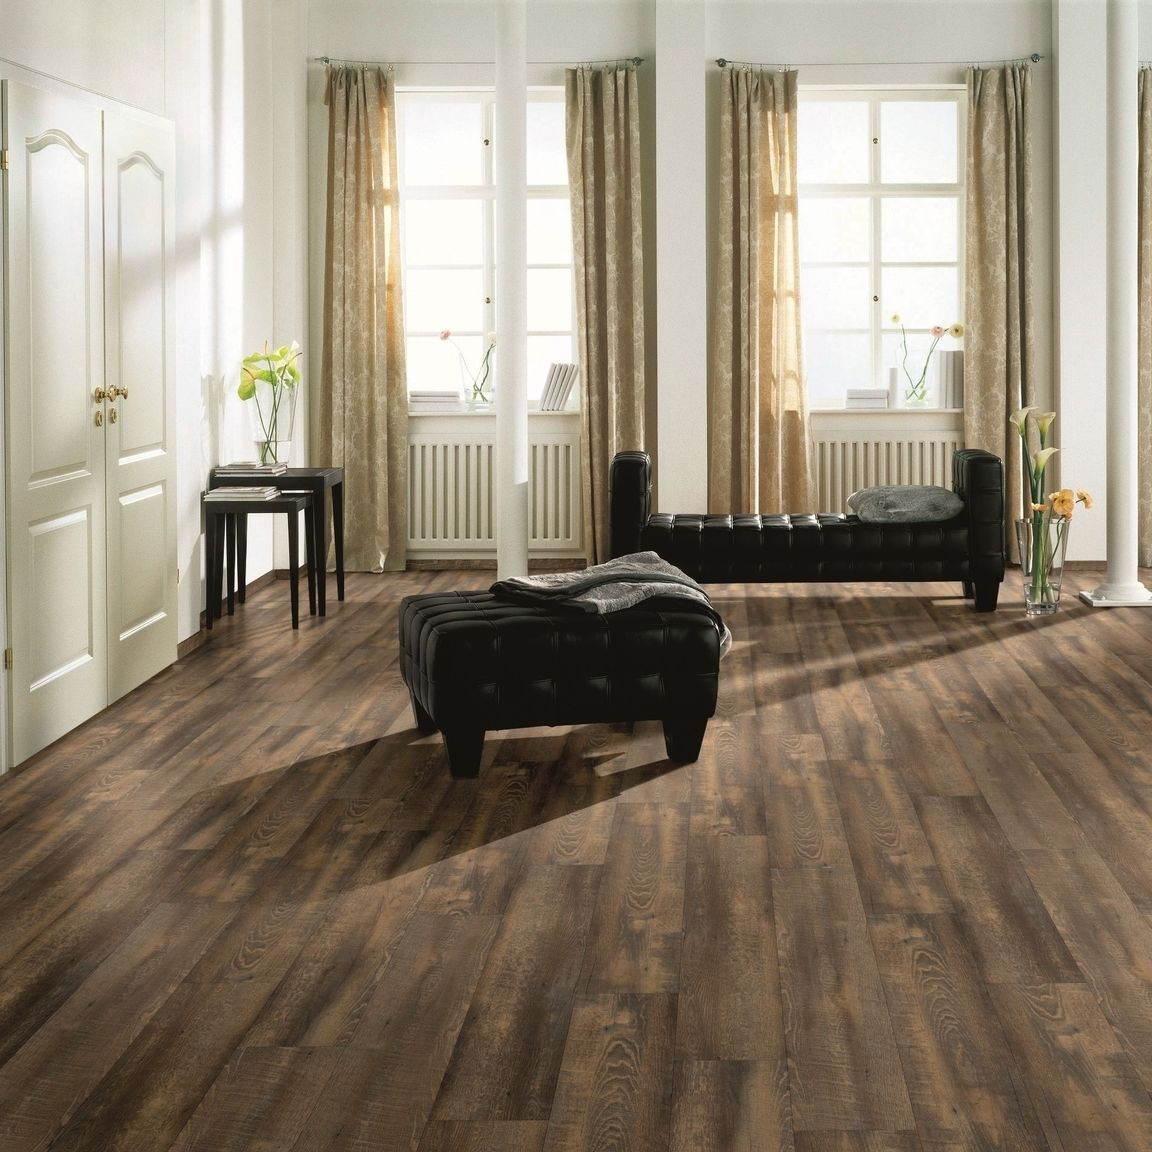 hori vinylboden pvc klick boden eiche chalet toulouse mit fase d mmung leisten ebay. Black Bedroom Furniture Sets. Home Design Ideas